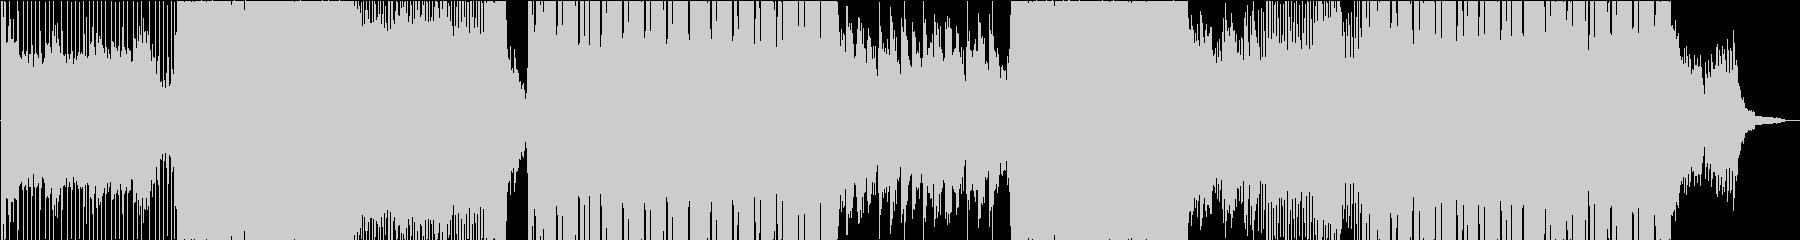 【BGM】水彩メリーゴーランド インストの未再生の波形